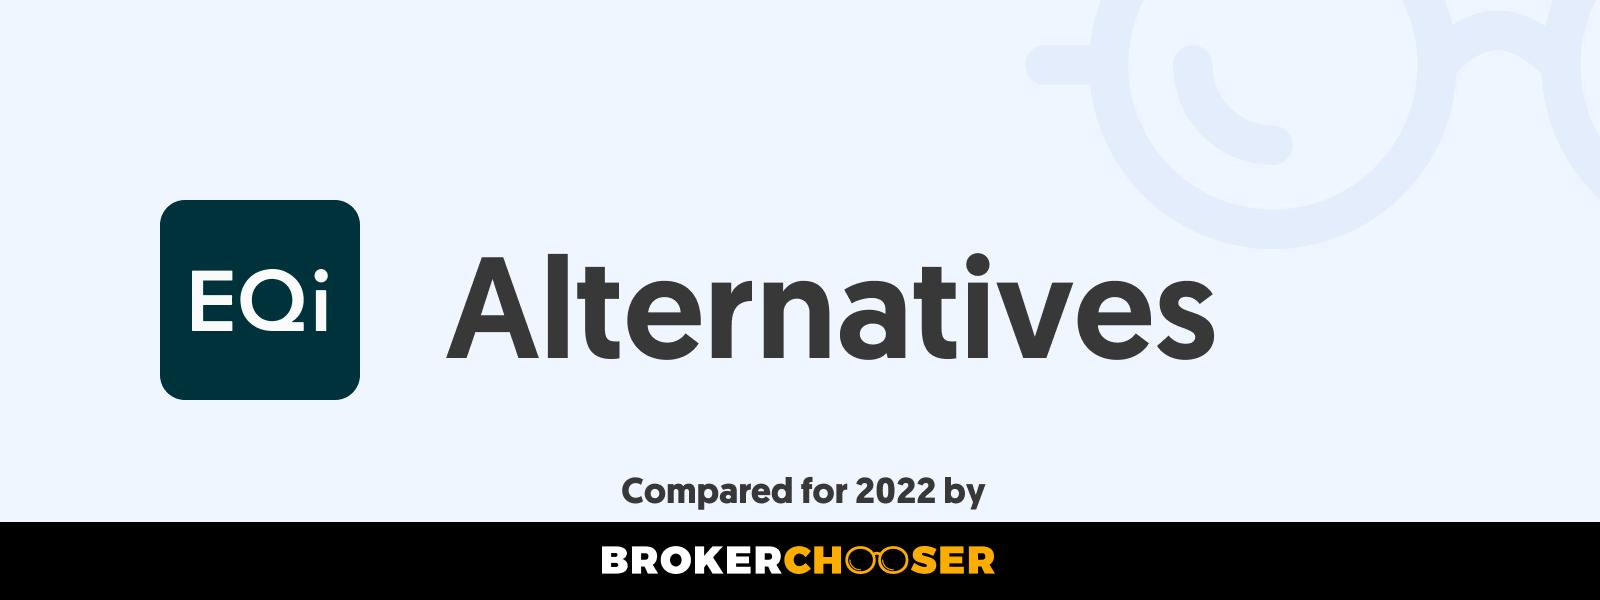 EQi Alternatives